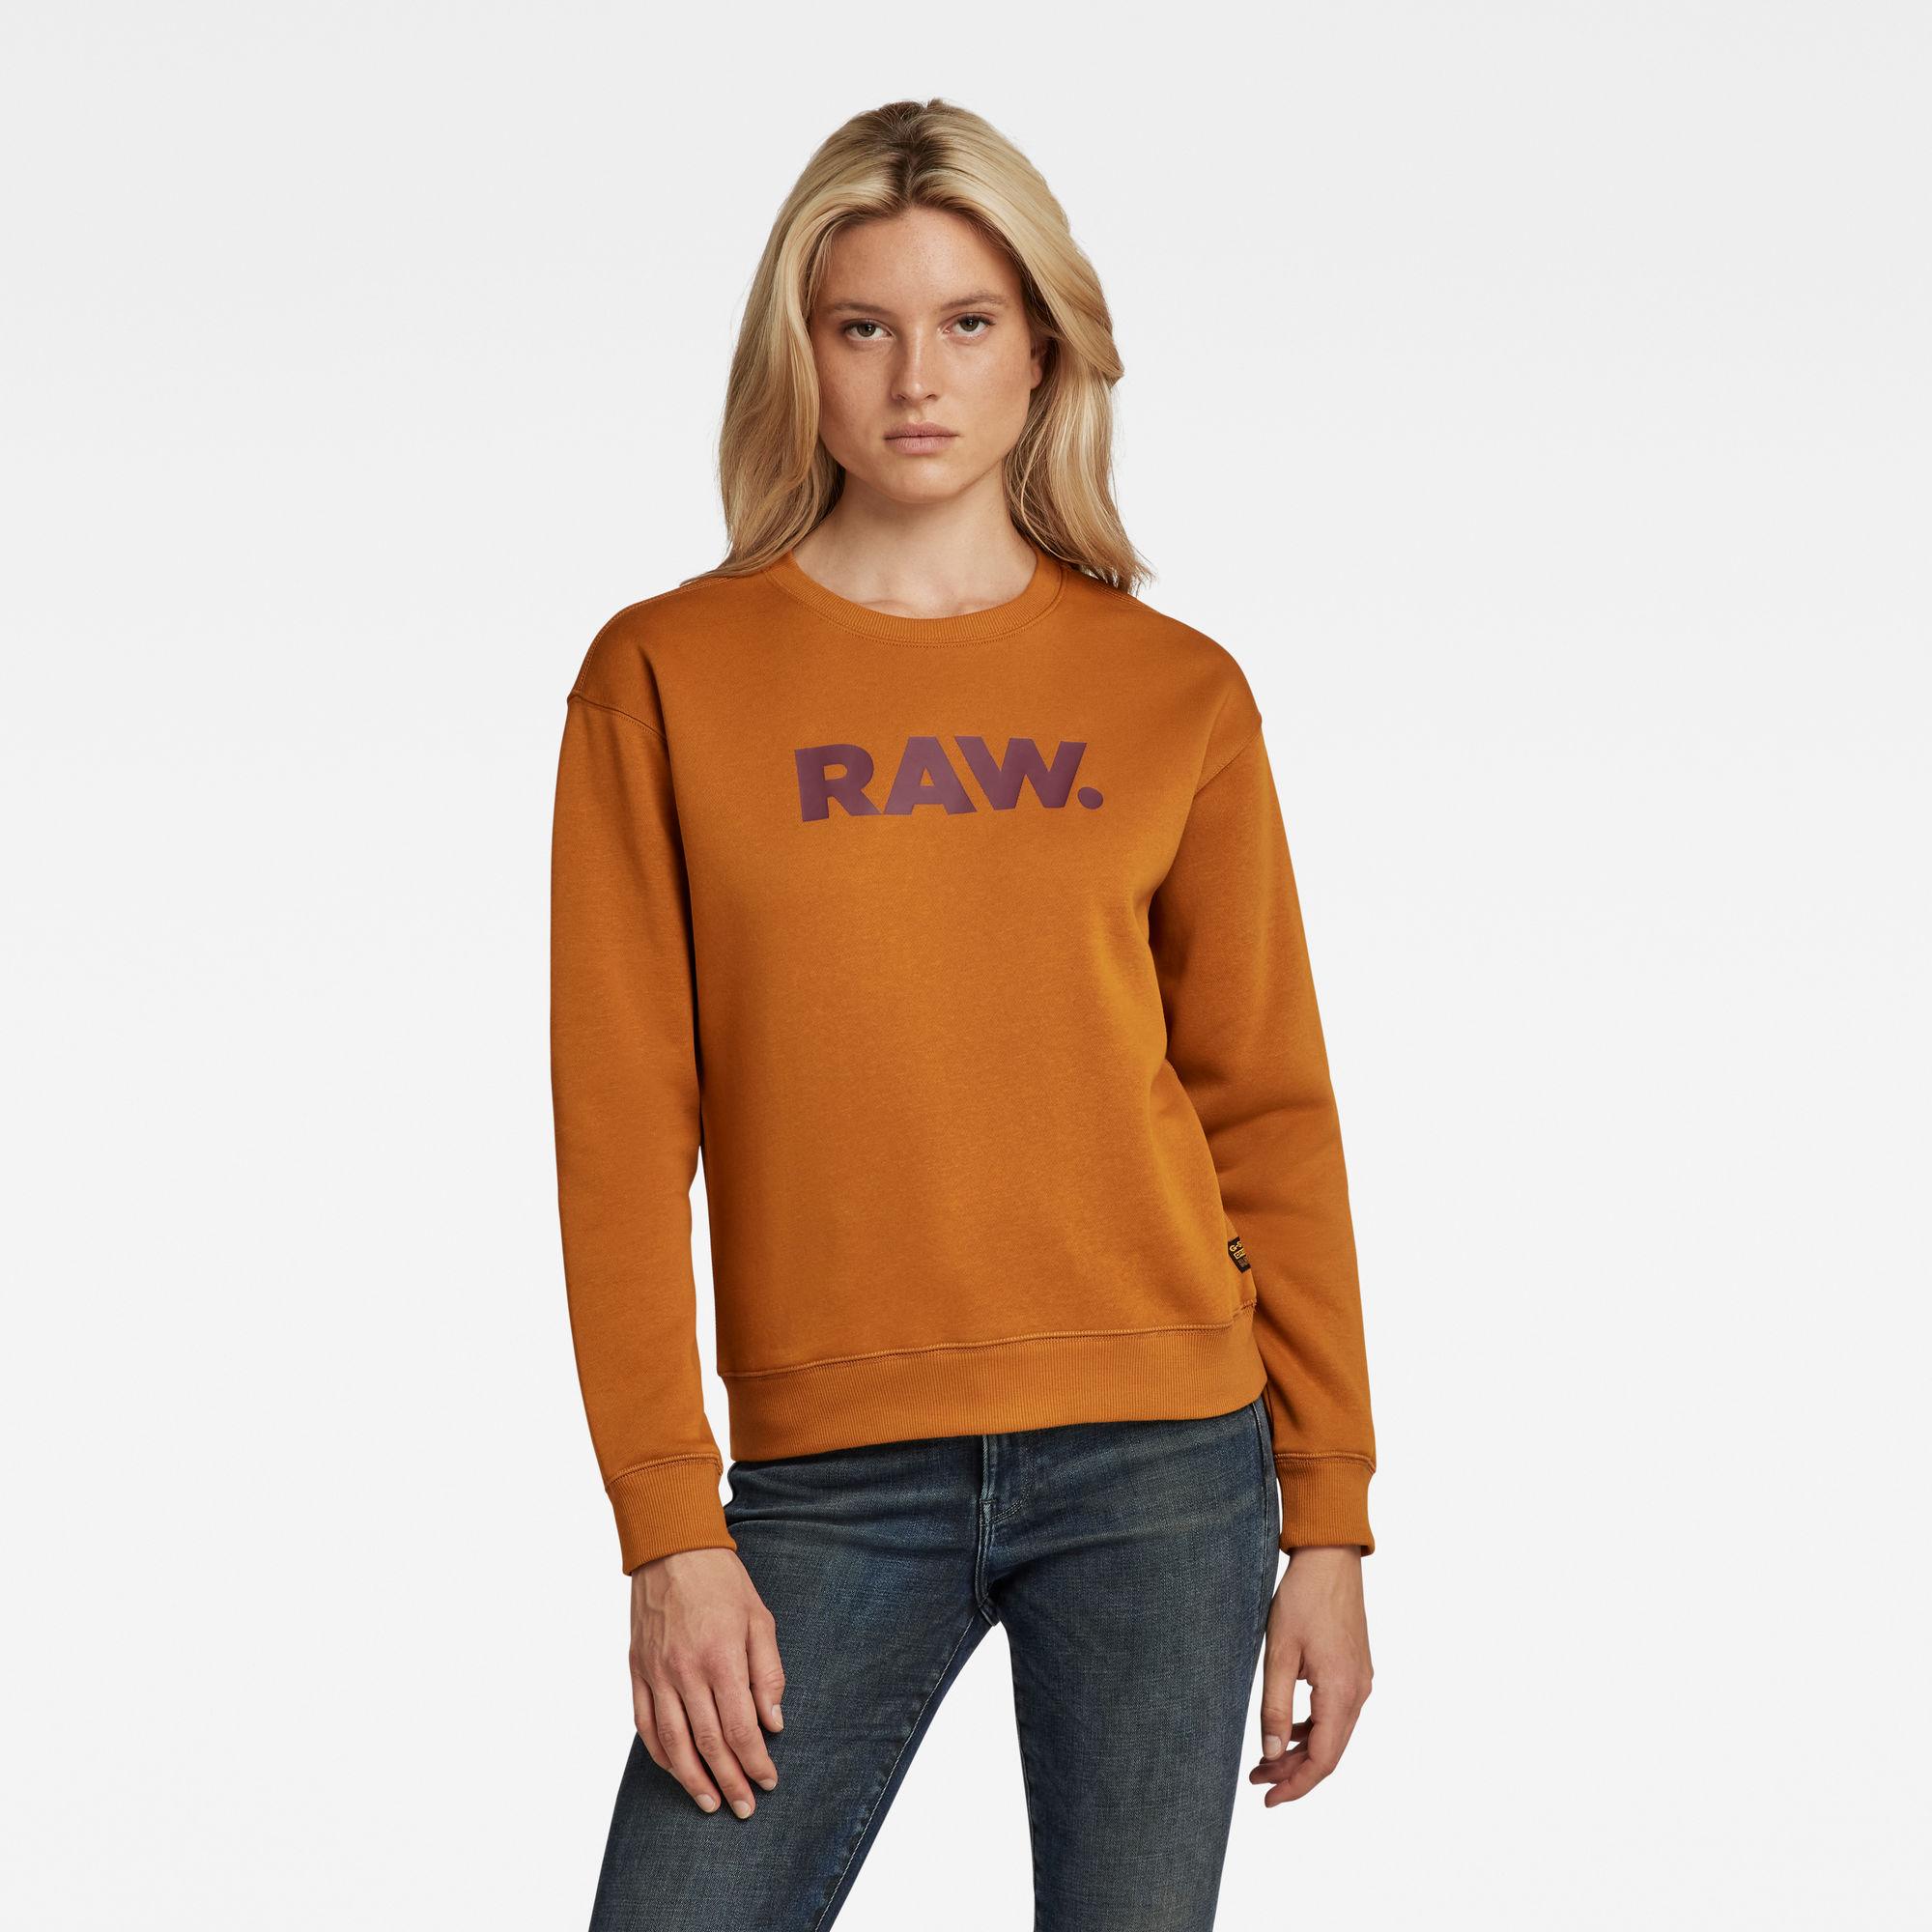 G-Star RAW Dames Premium Core RAW. Sweater Geel